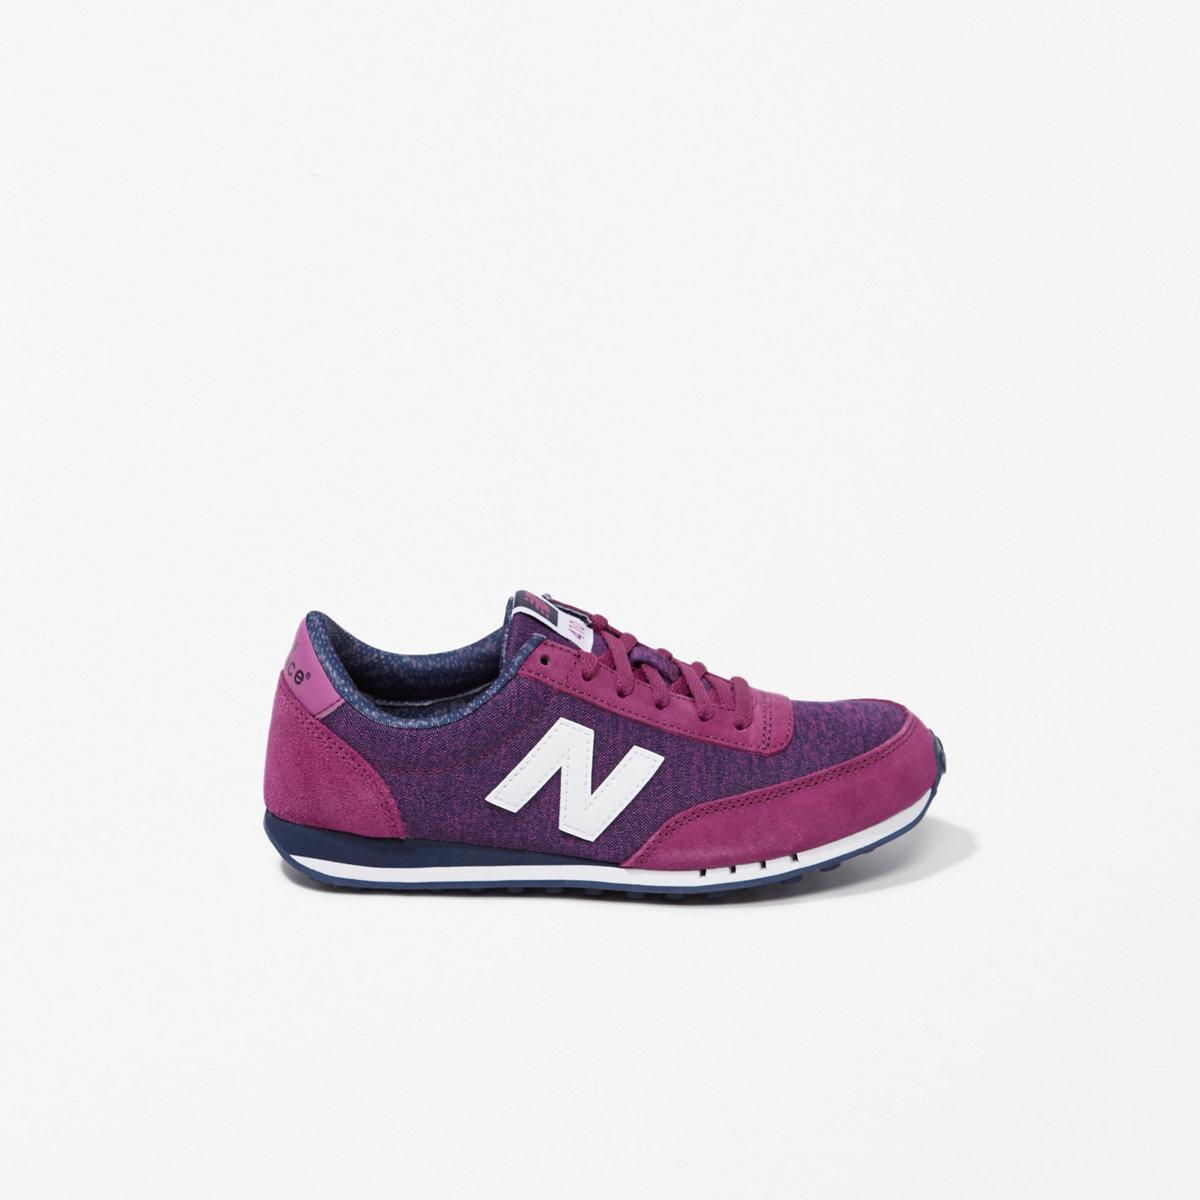 New Balance Optic Pop 410 Sneakers